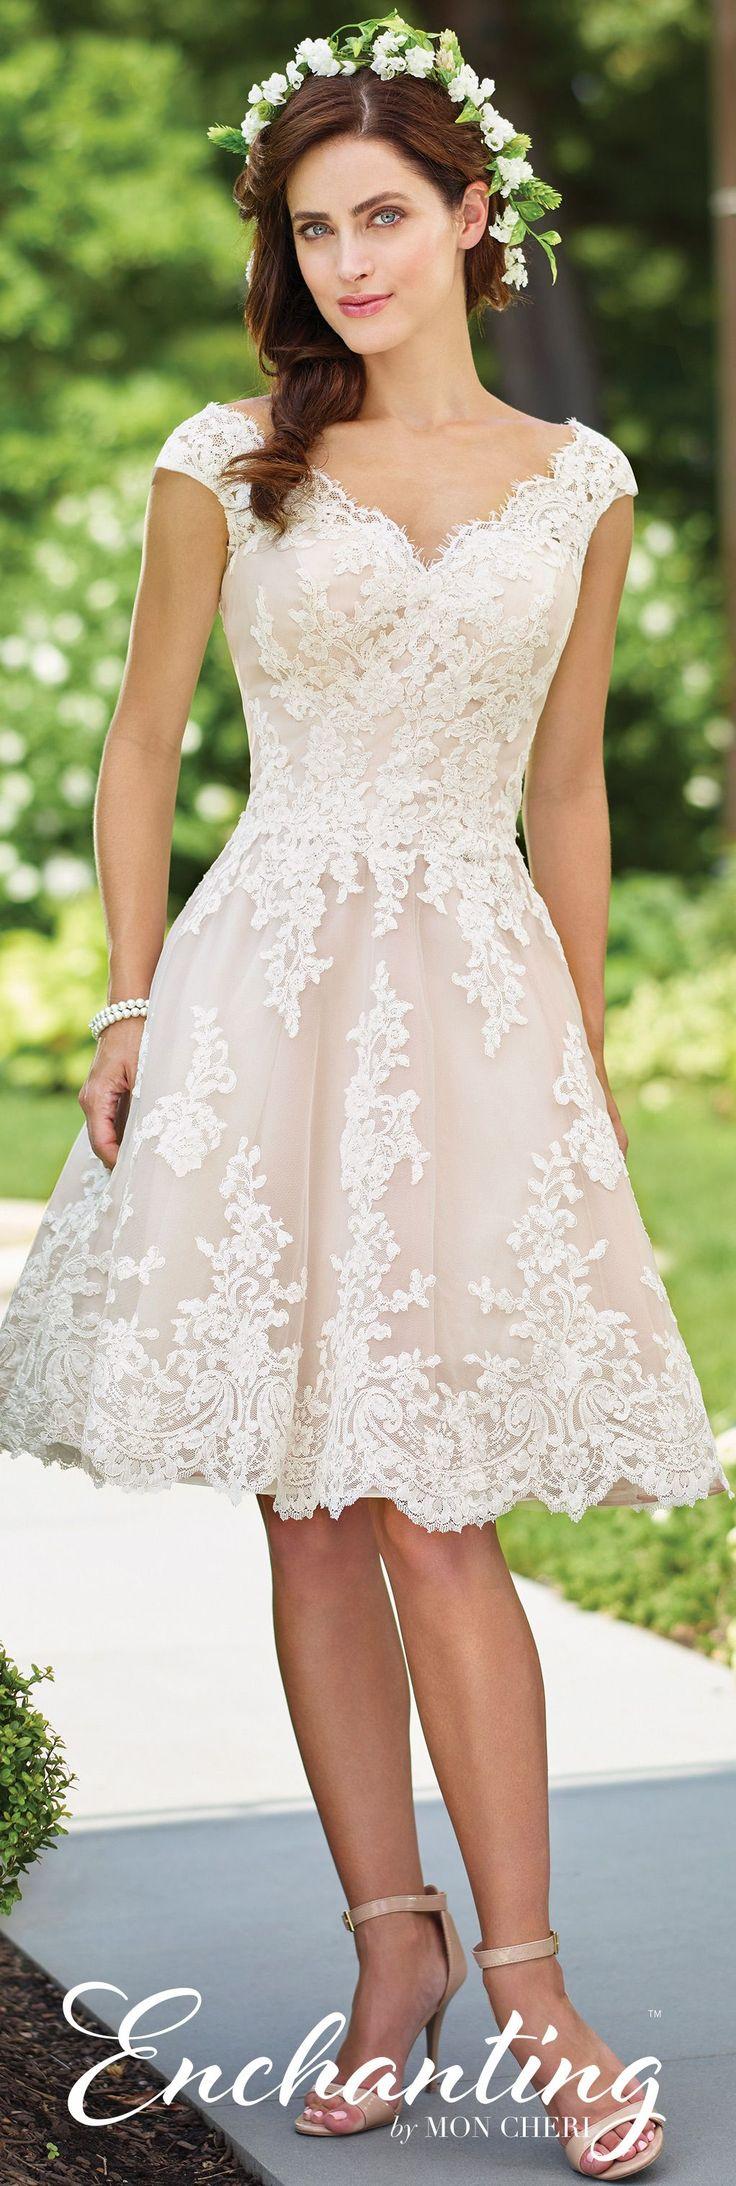 best mog wedding images on pinterest homecoming dresses straps